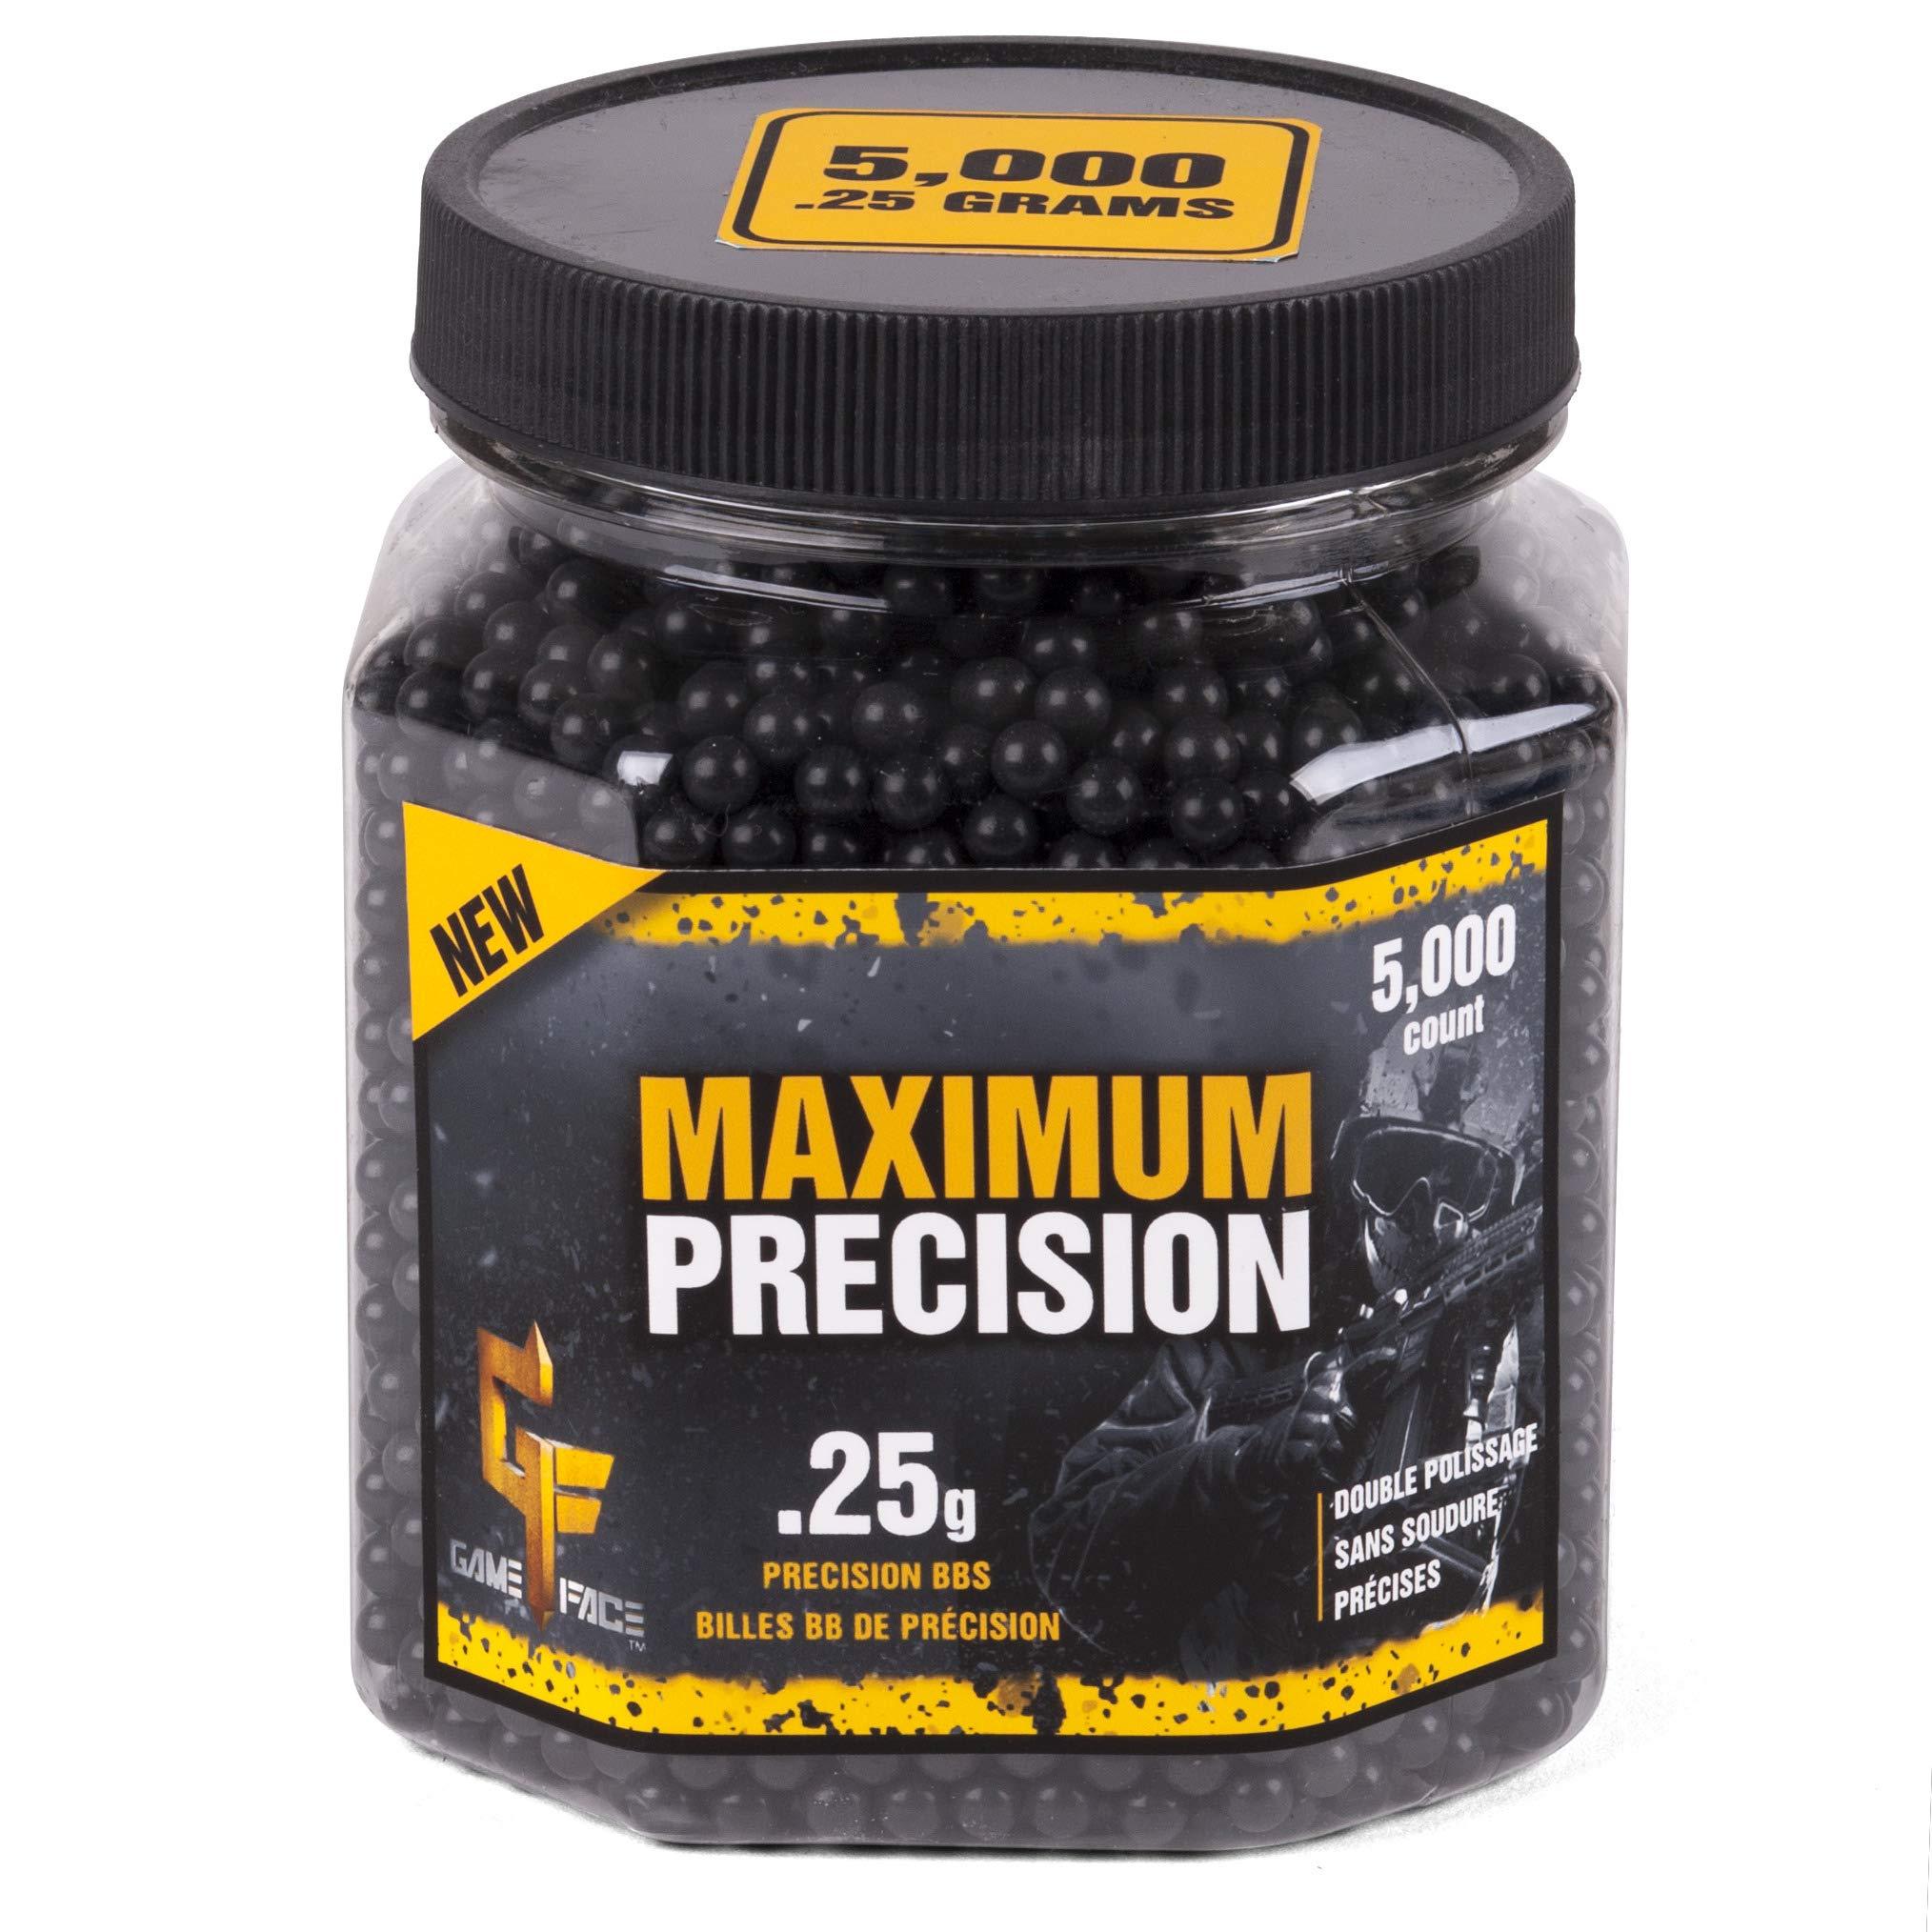 GameFace 25GPB5J Maximum Precision Heavy-Weight .25-Gram Black Airsoft BBs (5000-Count)